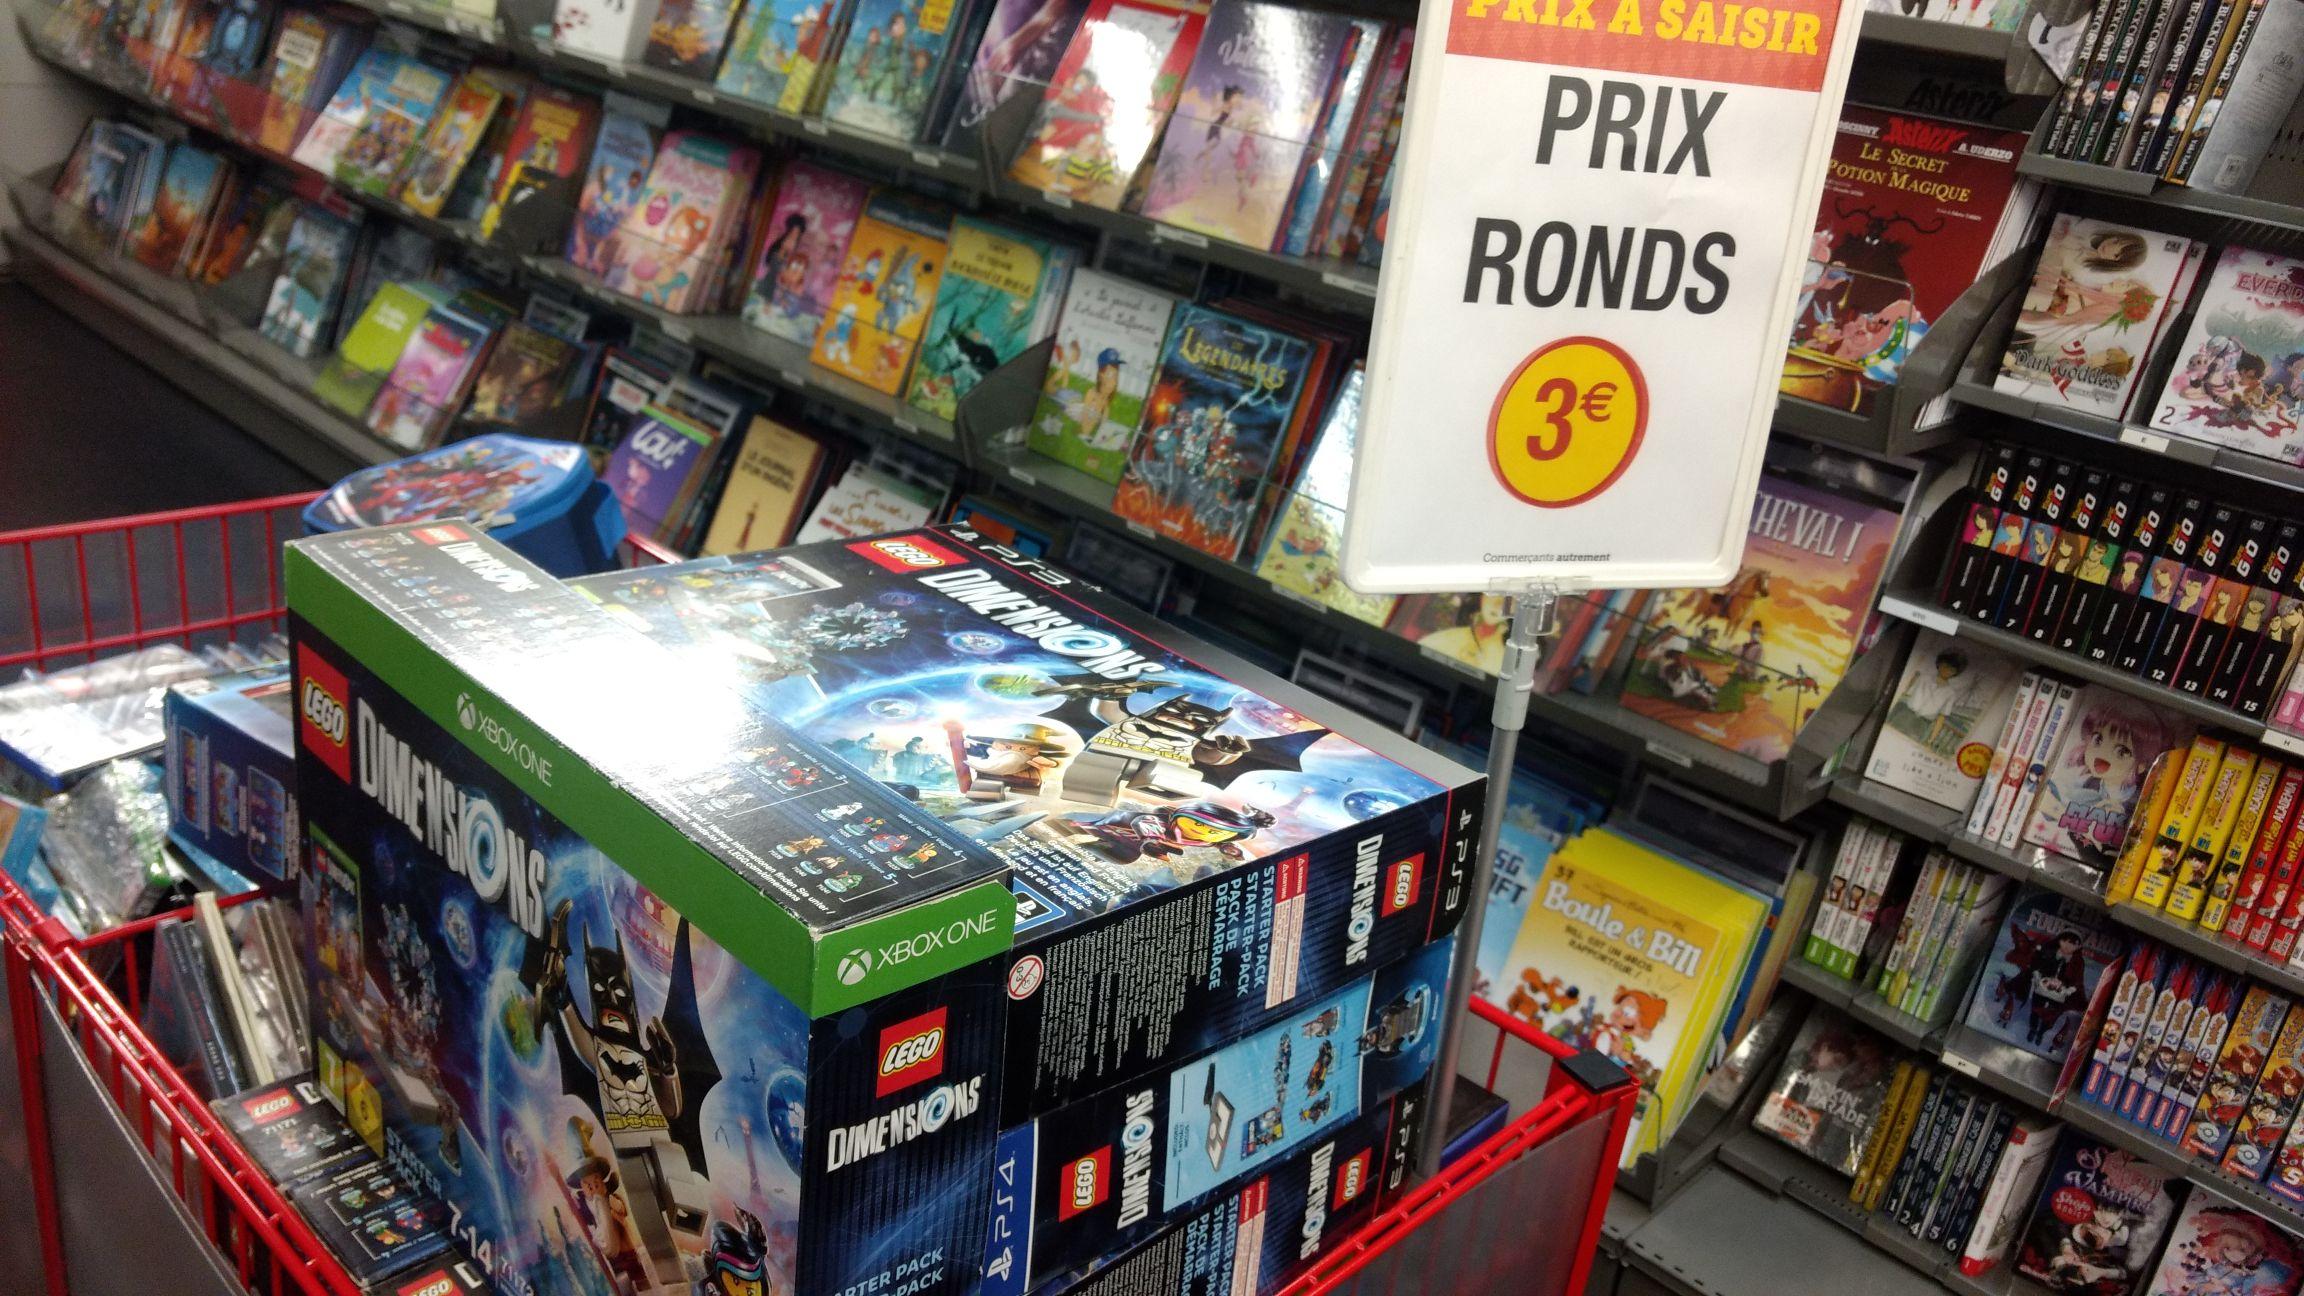 Lego Dimensions sur Xbox One, PS4 ou PS3 -  Hyper U Limoges Corniac (87)